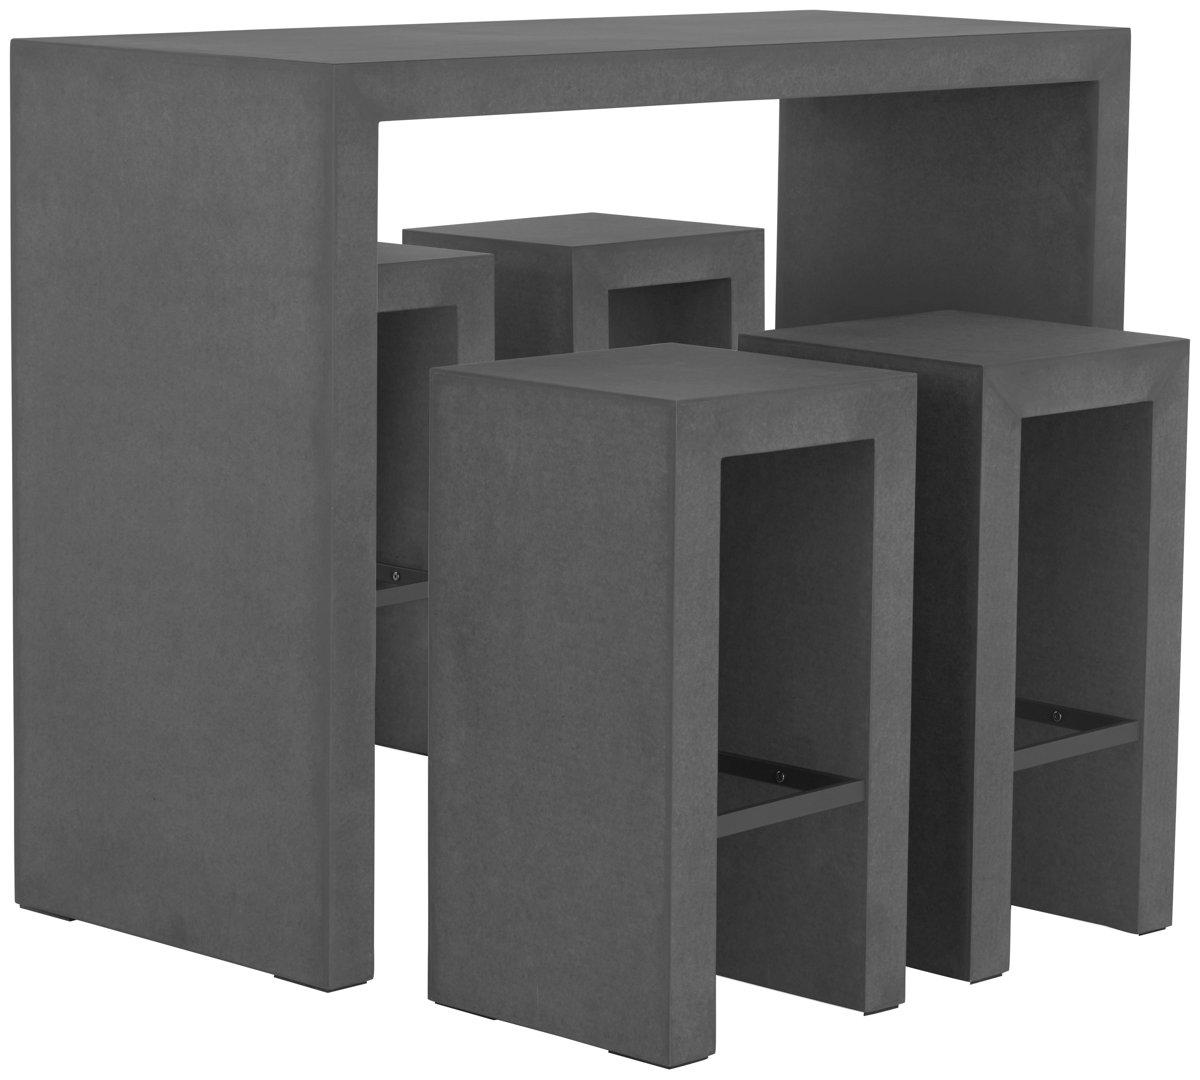 City Furniture Sydney Concrete High Dining Table : S1609708756N00wid1200amphei1200ampfmtjpegampqlt850ampopsharpen0ampresModesharp2ampopusm1180ampiccEmbed0 from www.cityfurniture.com size 1200 x 1200 jpeg 100kB